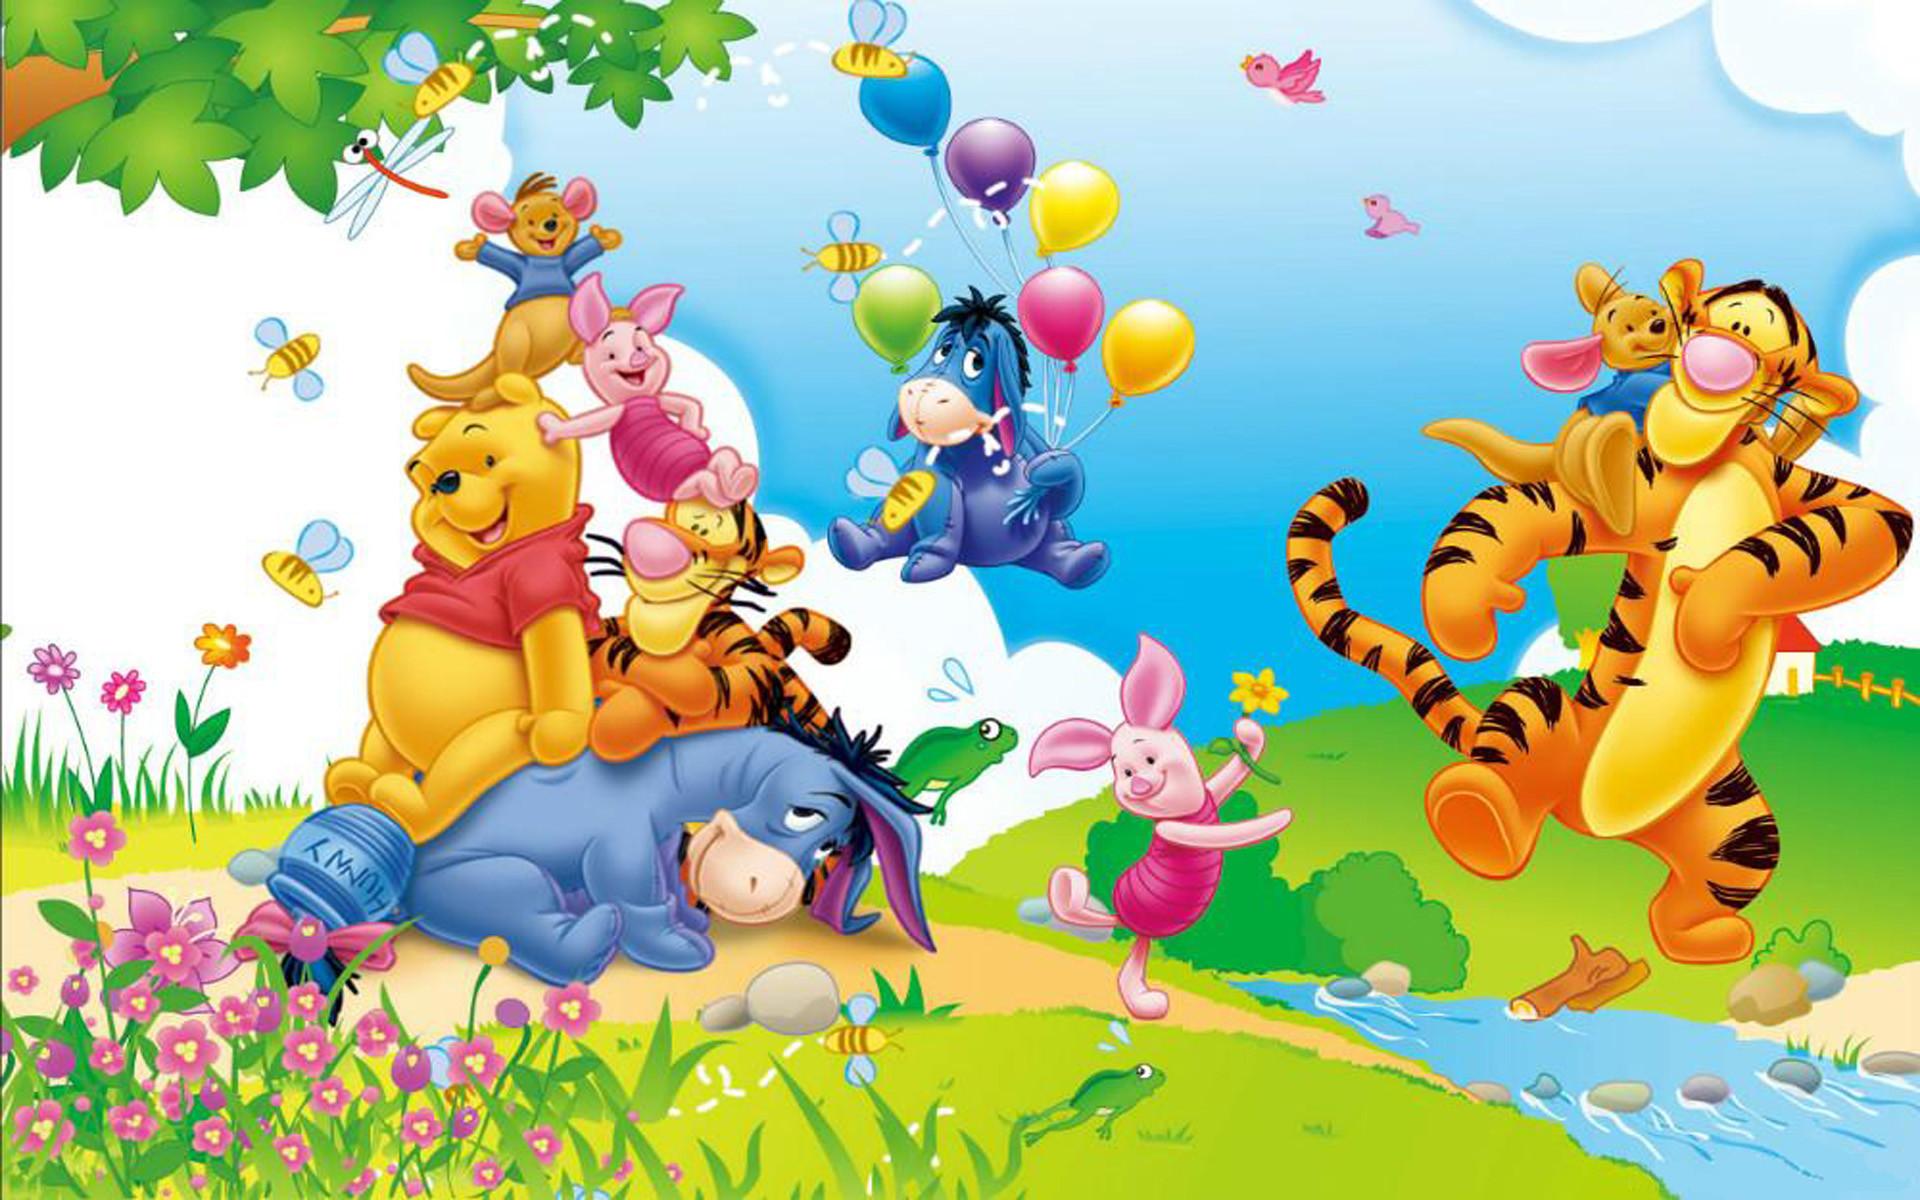 Winnie the pooh backgrounds 63 images 1920x1200 1920x1200 83 winnie the pooh wallpapers winnie the pooh backgrounds download voltagebd Choice Image